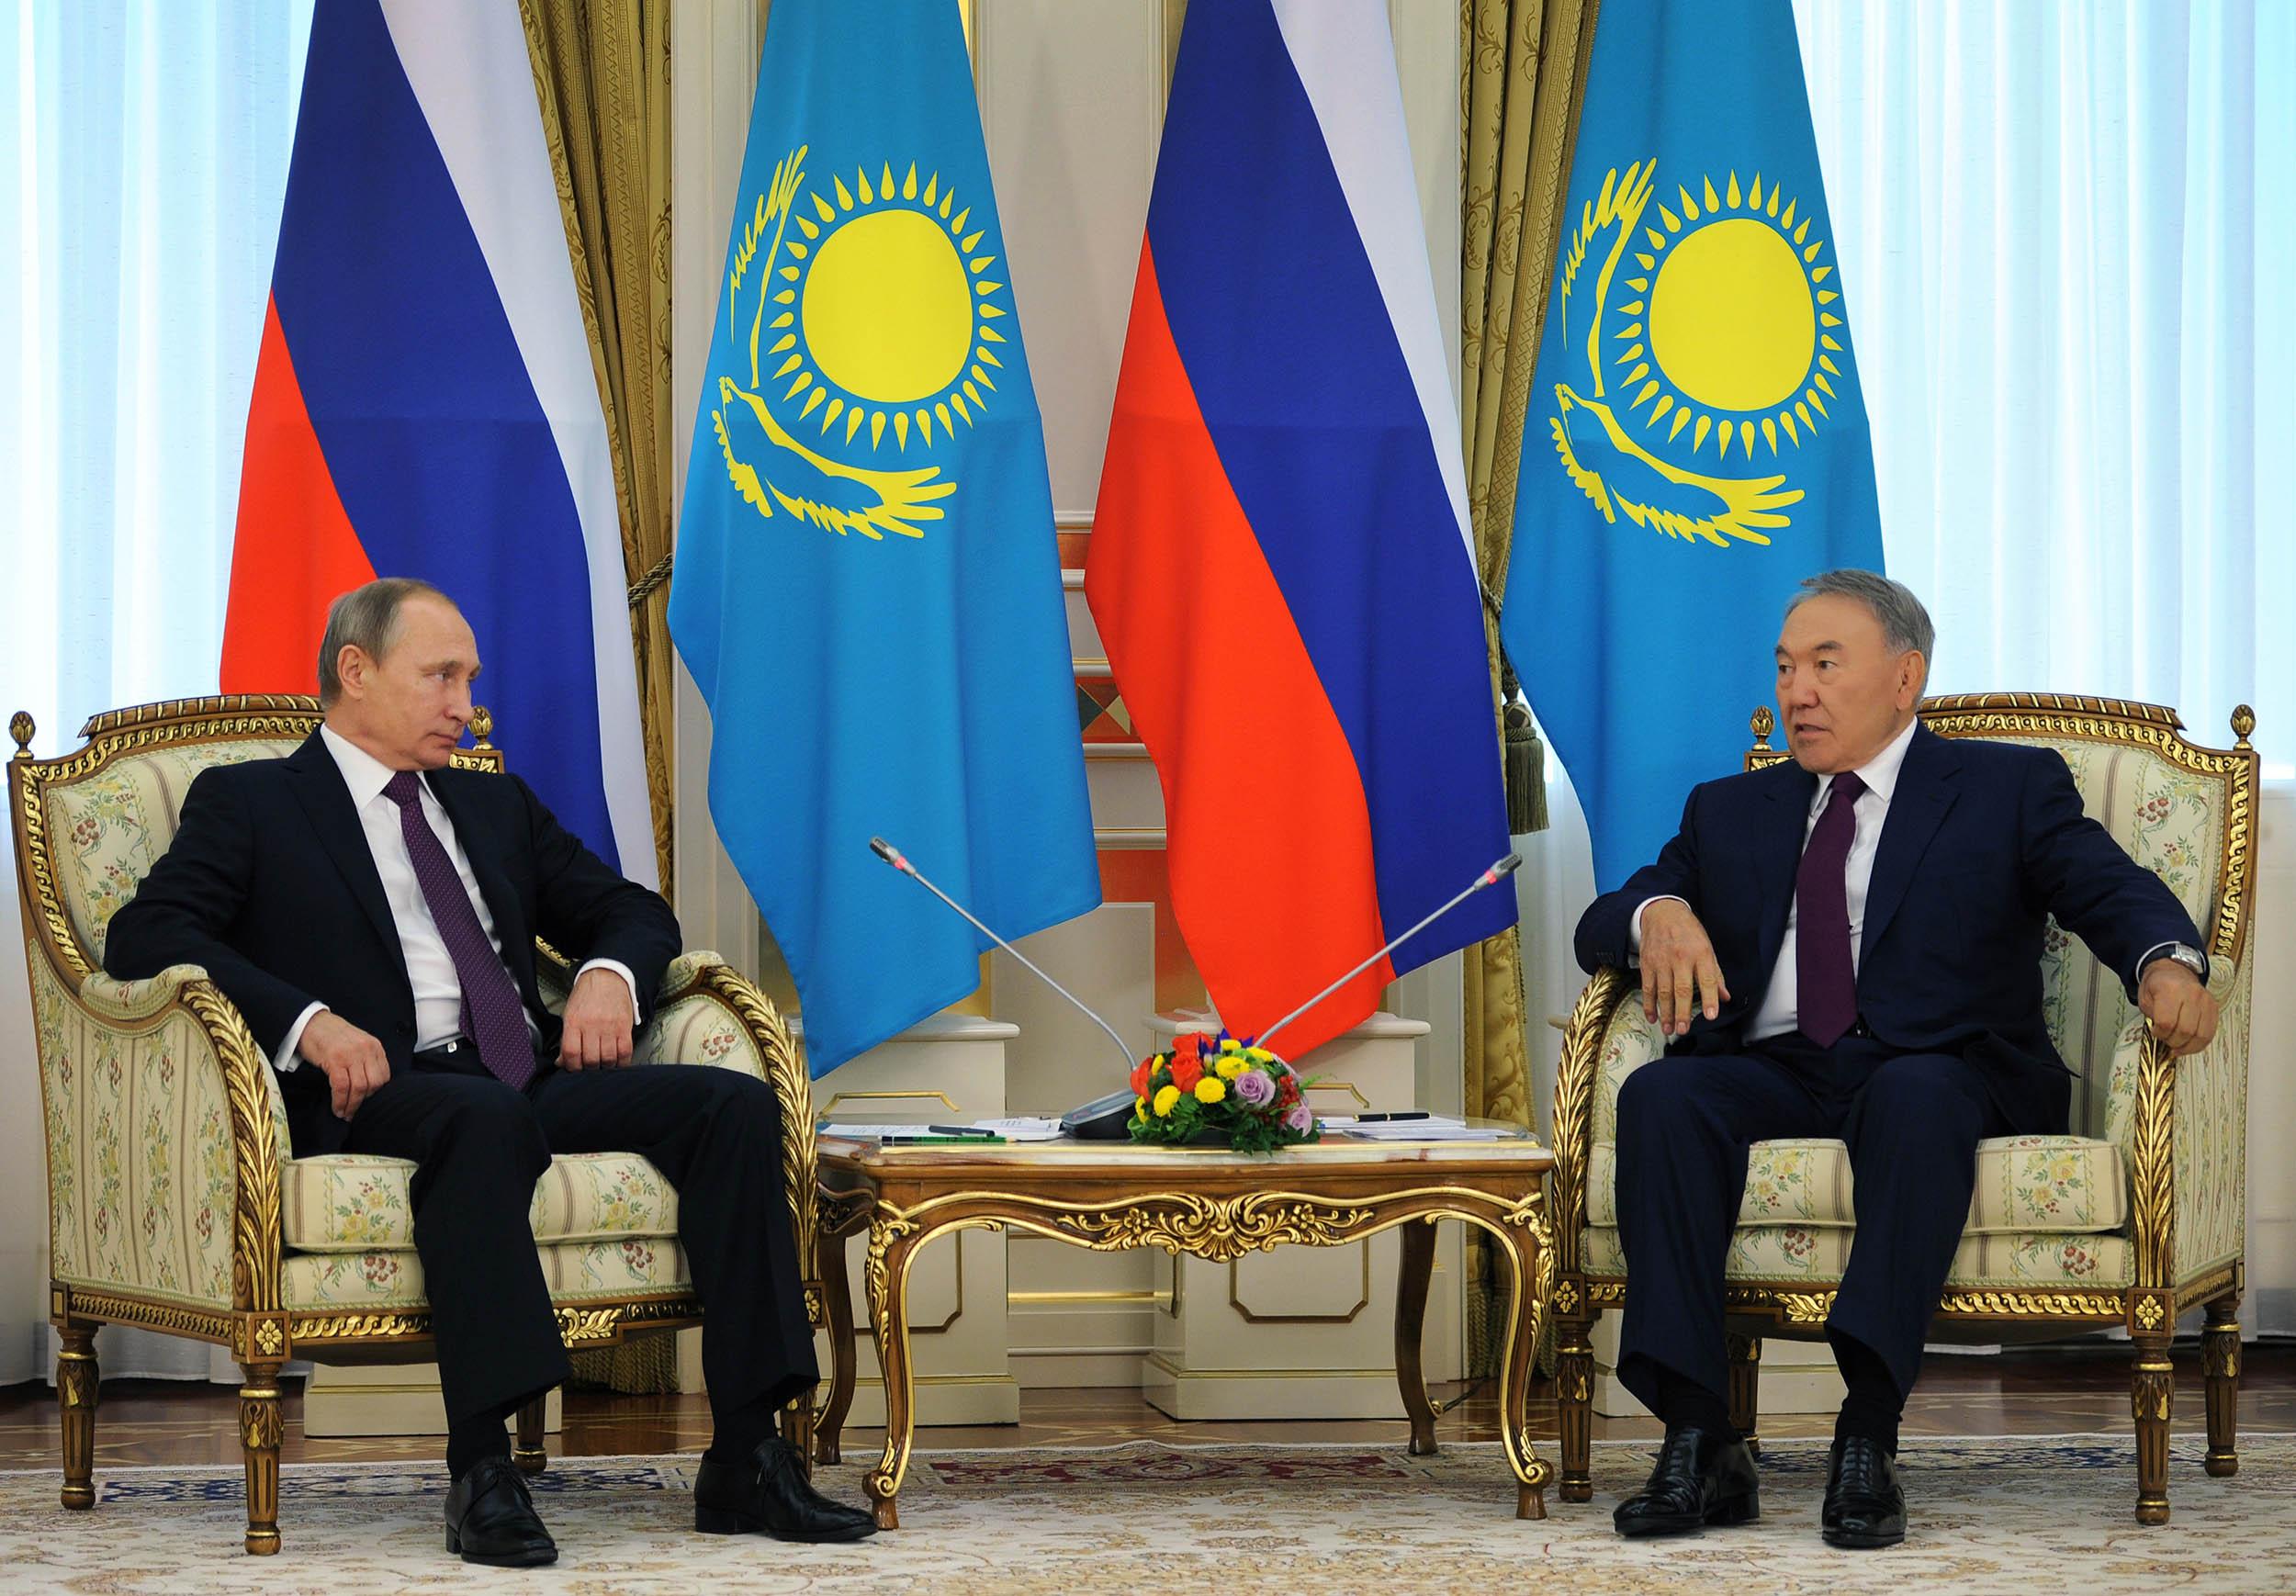 Vladimir Putin of Russia and Nursultan Nazarbayev of Kazakhstan